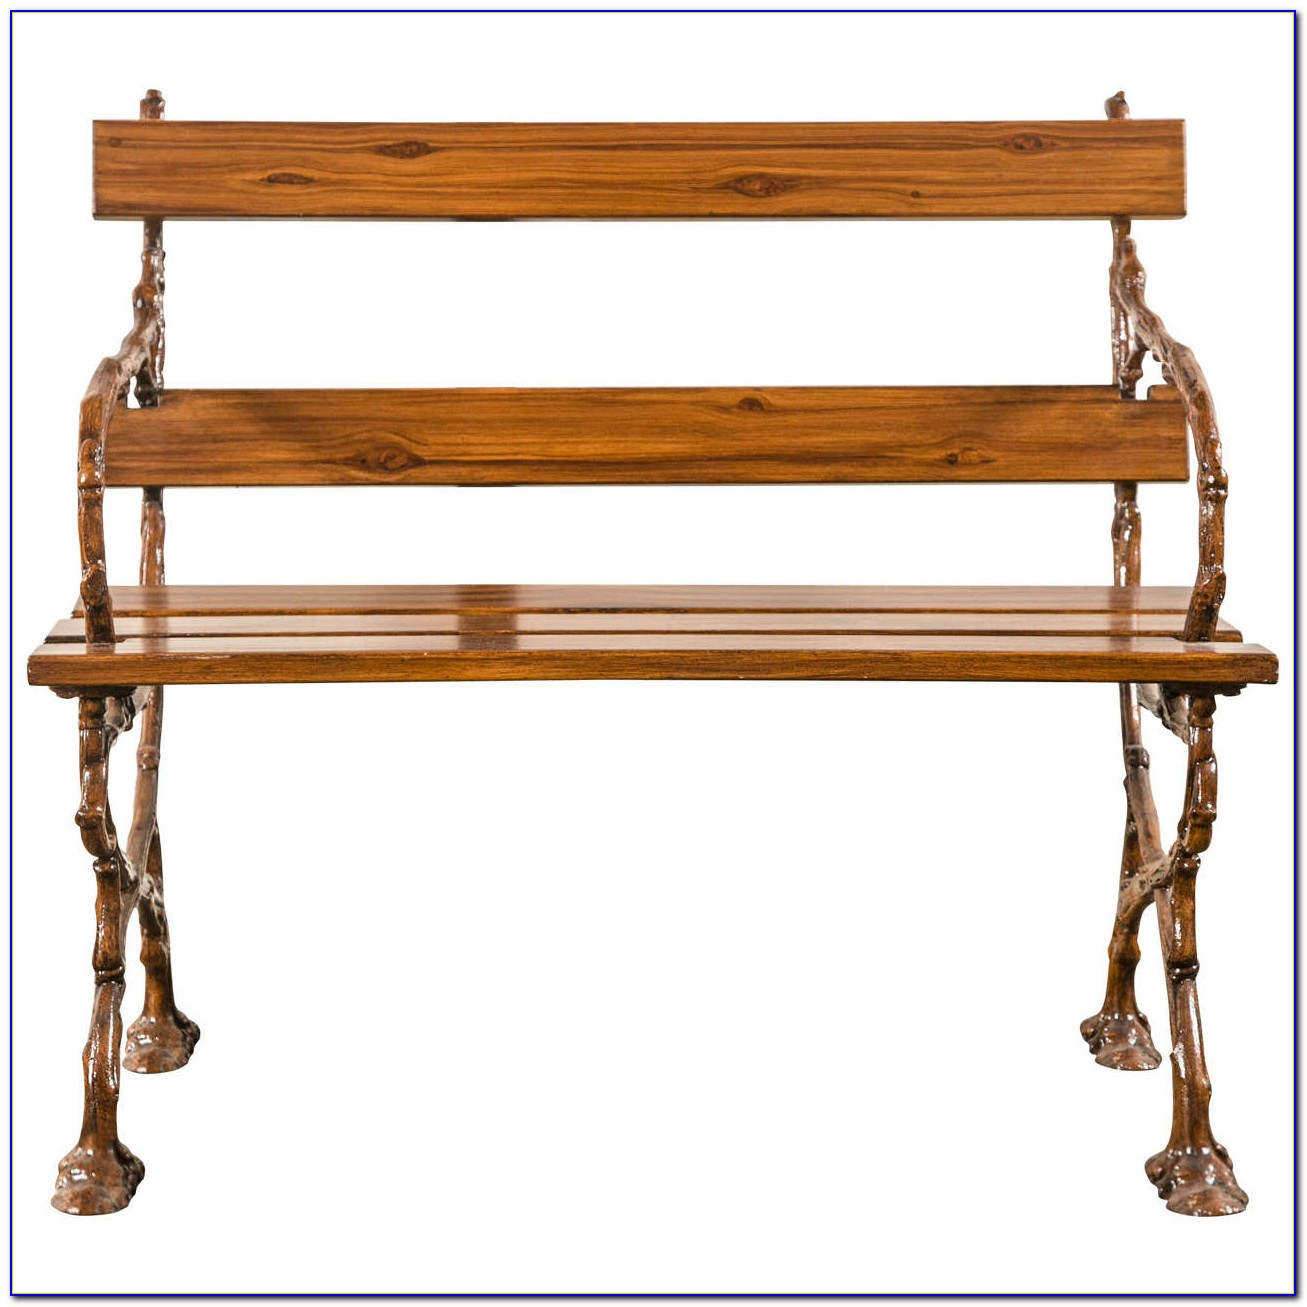 Wrought Iron Bench Seat Gumtree